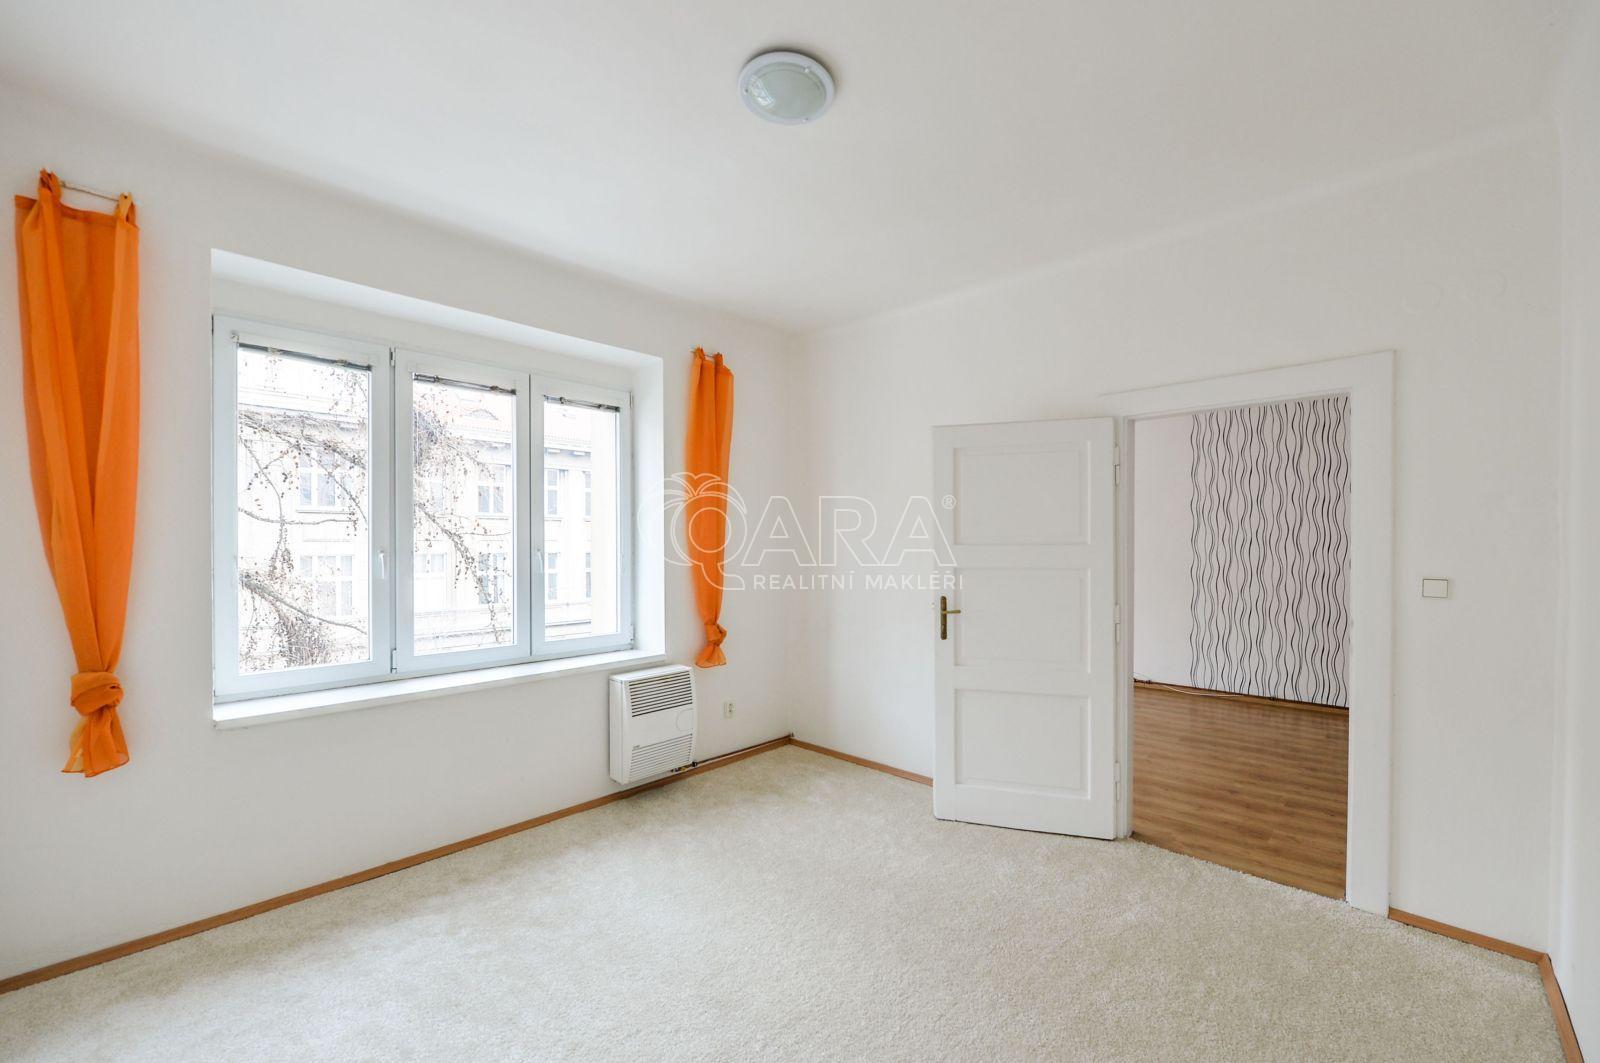 Byt 2+1 52 m2, Praha 6 – Dejvice, Zikova ul.